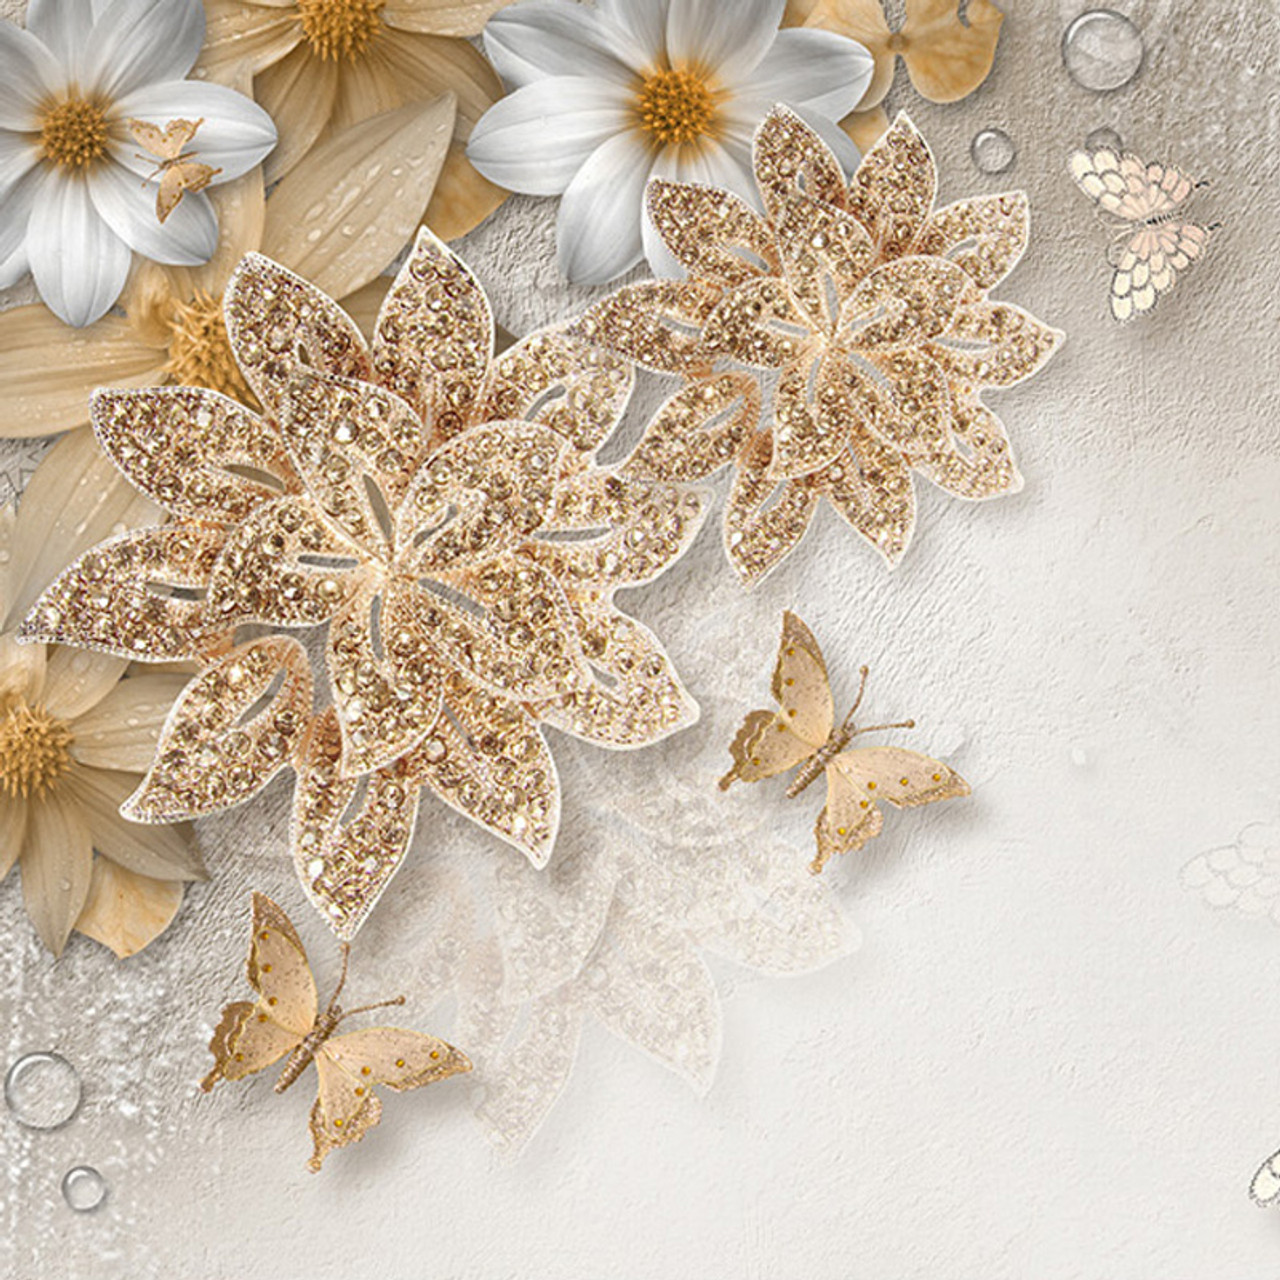 Custom Mural Wallpaper For Bedroom Walls Luxury Gold Jewelry Flower Butterfly Background Wall